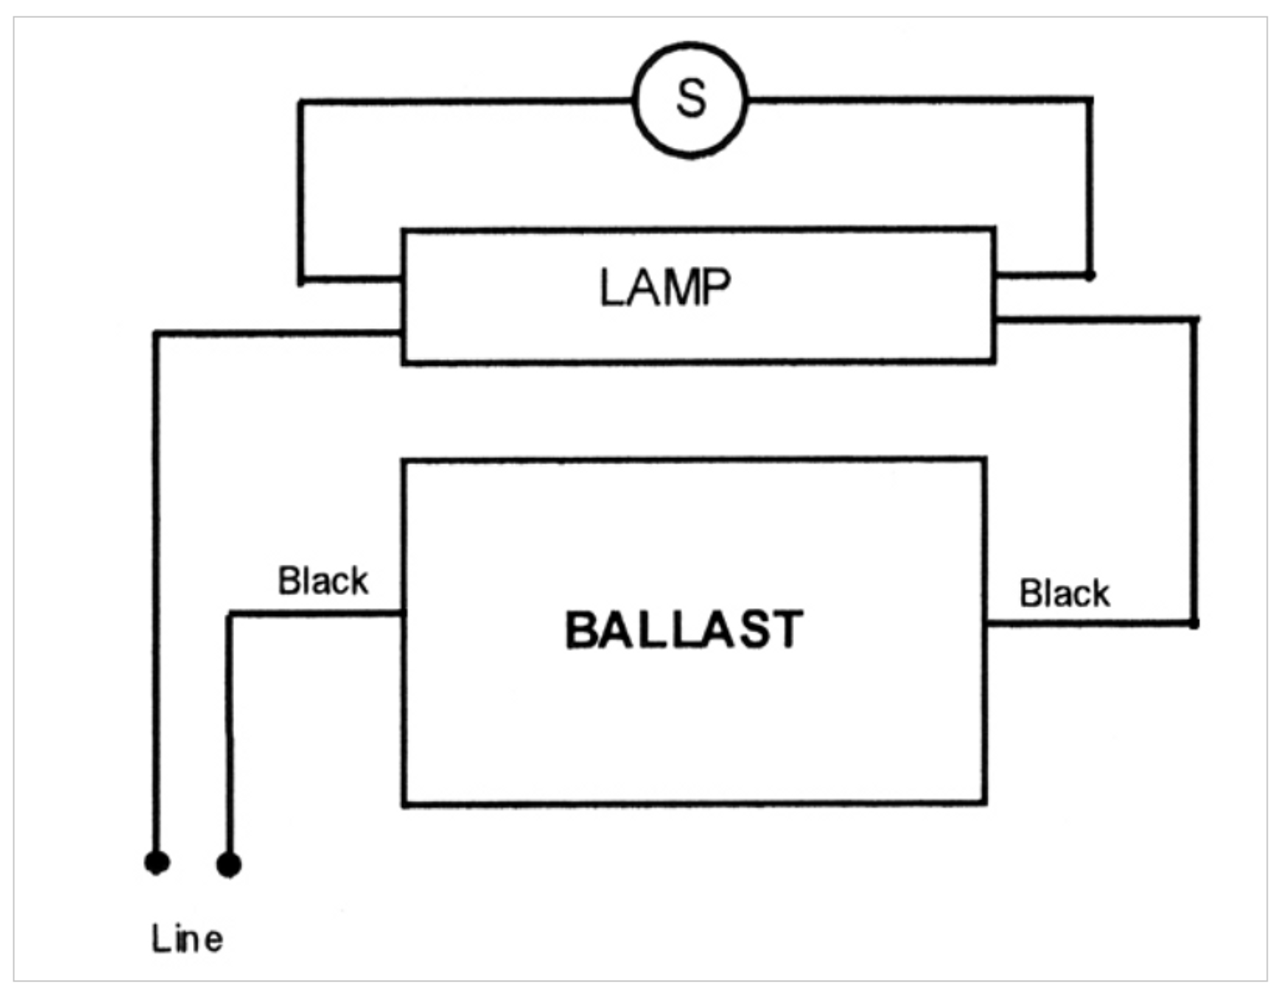 hight resolution of robertson ballast wiring diagram wiring diagrams lolsp48 robertson magnetic ballast f4t5 f6t5 f8t5 lamps